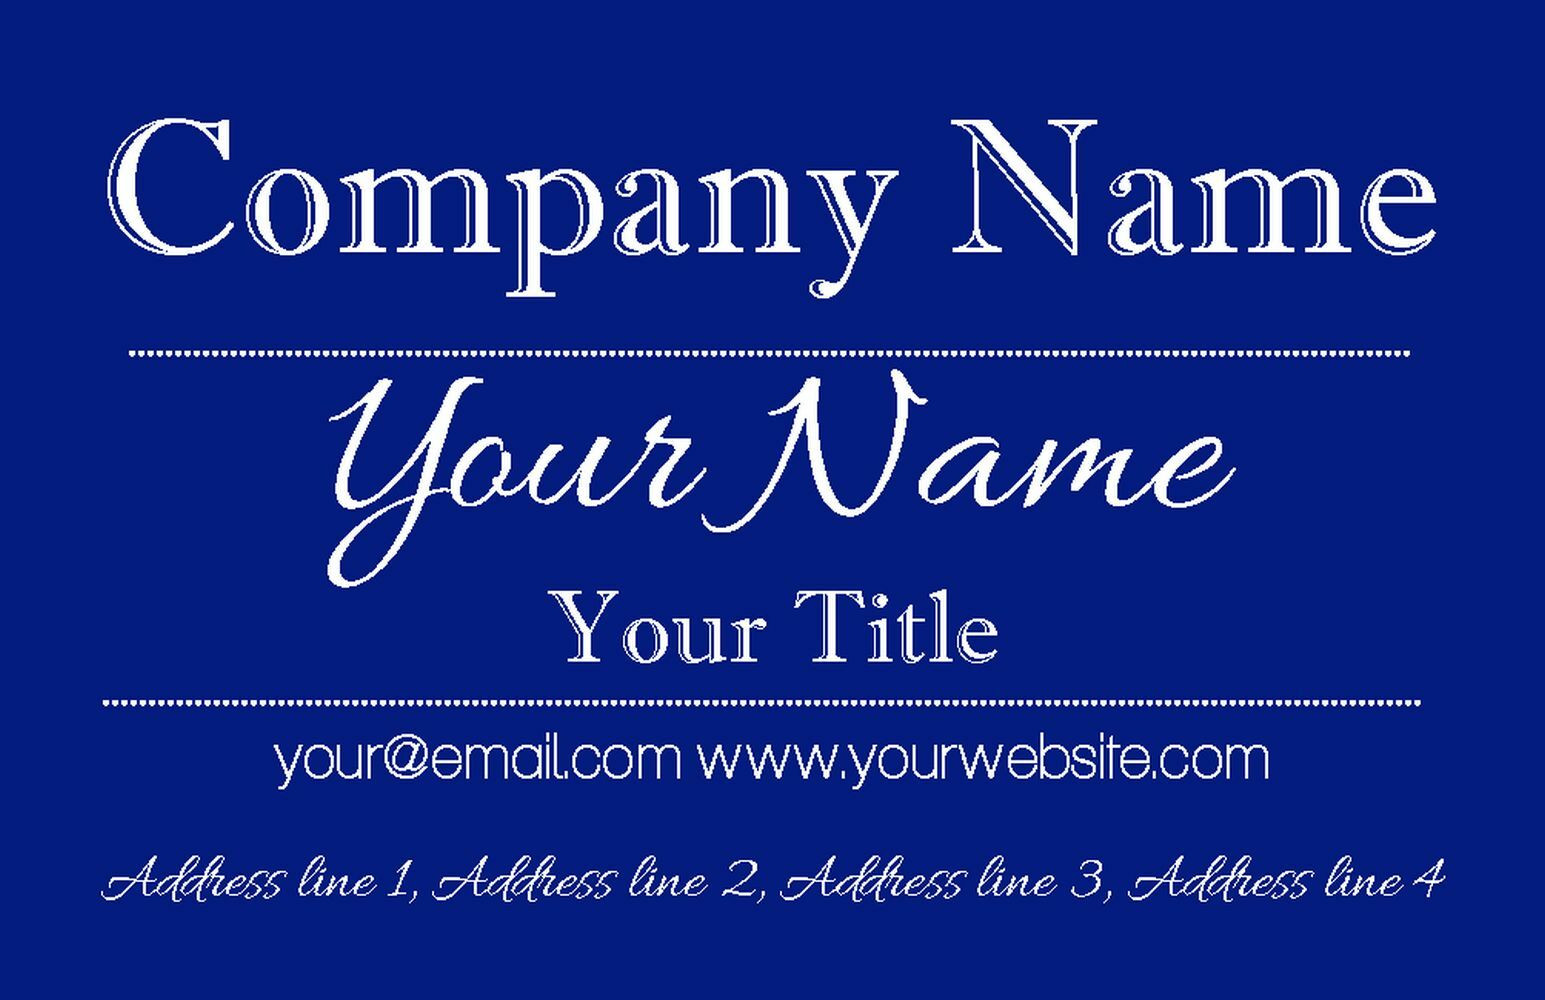 Deep Blau Blau Blau Classique Personalised Business Cards 743083